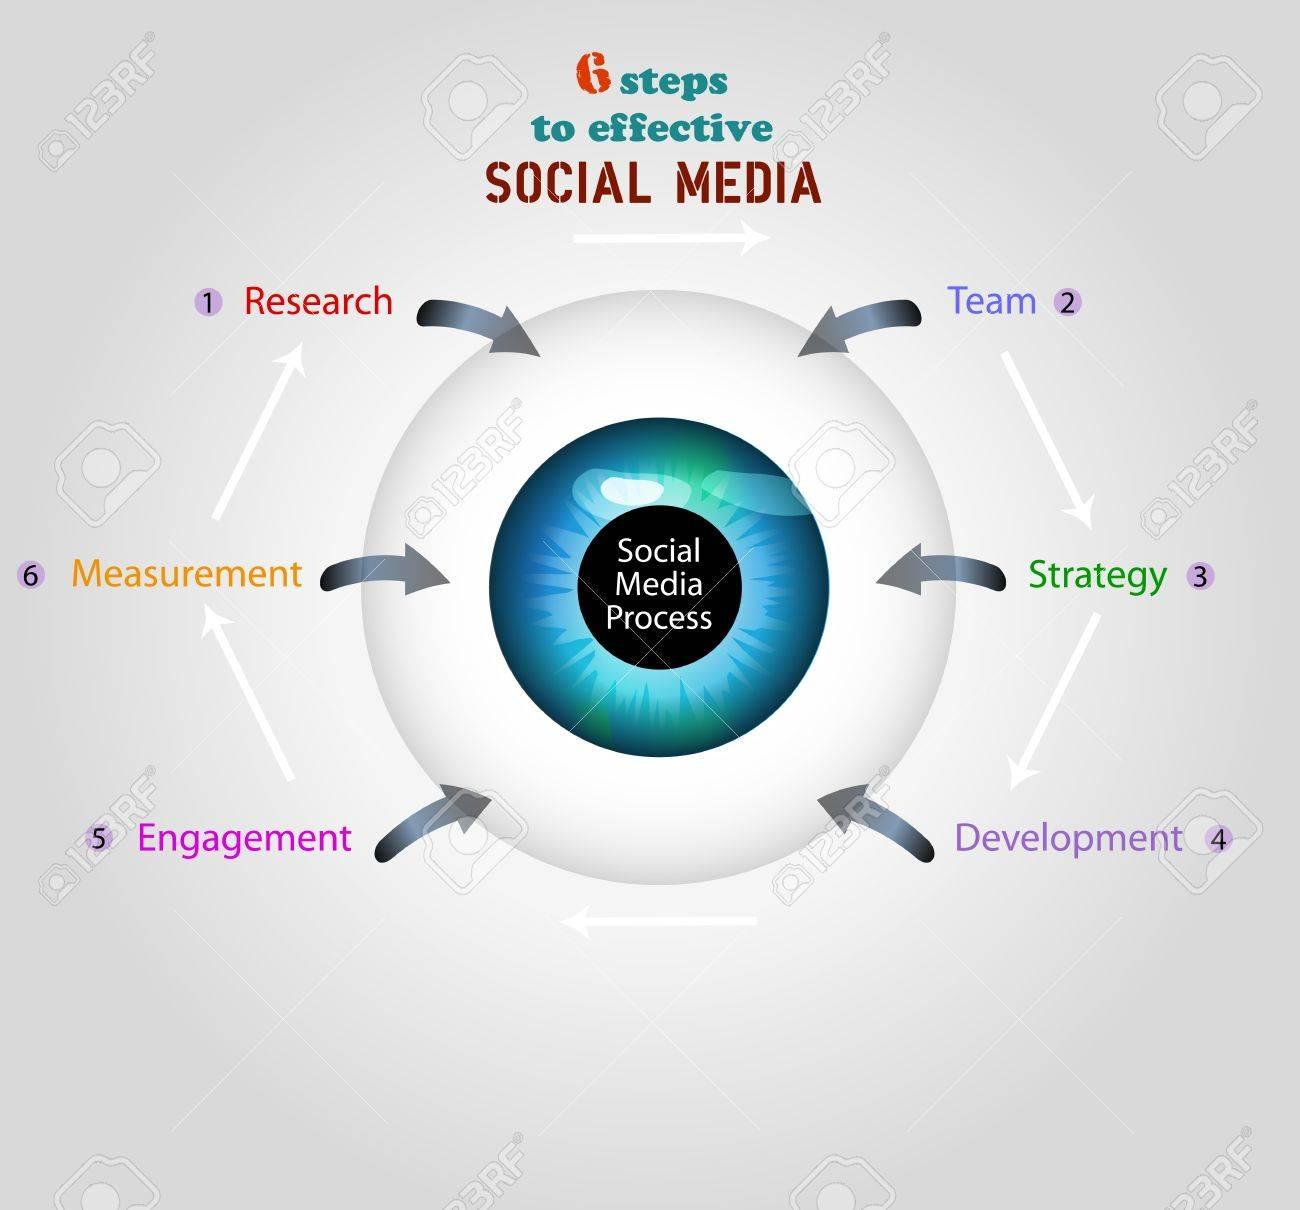 social media business plan  / concept, free copy space Stock Vector - 17816915